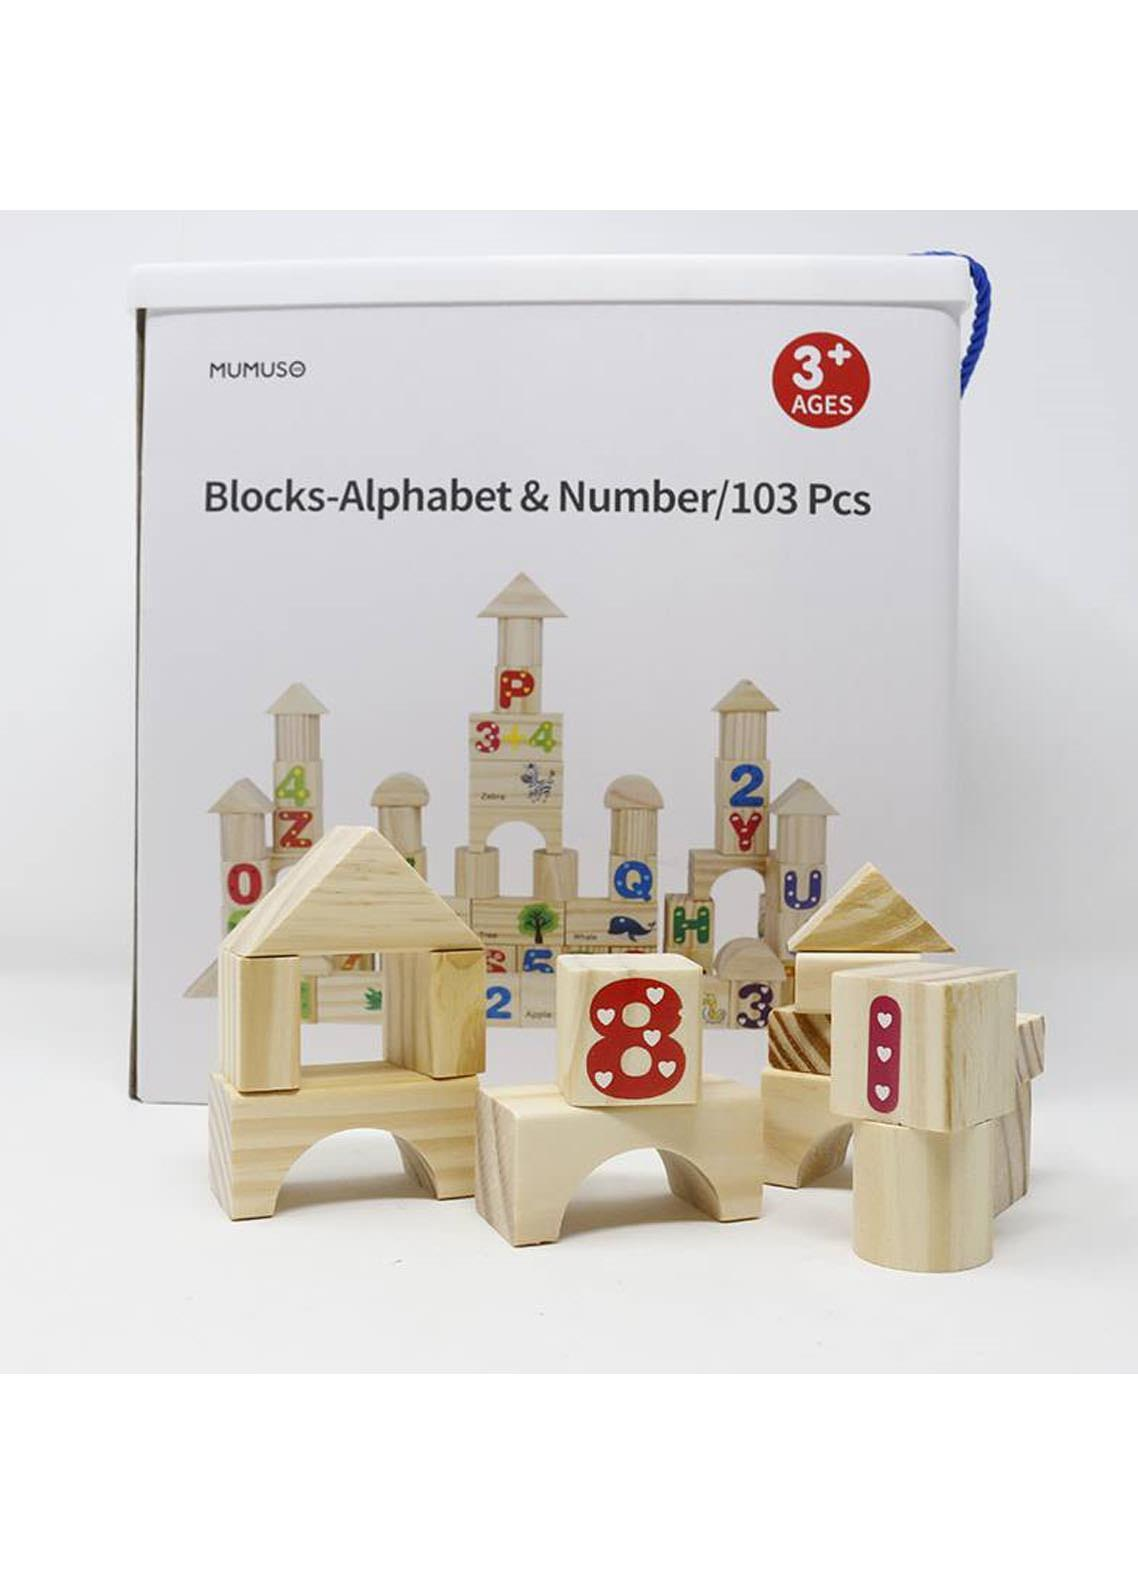 Mumuso BLOCKS-ALPHABET & NUMBER-103 PCS